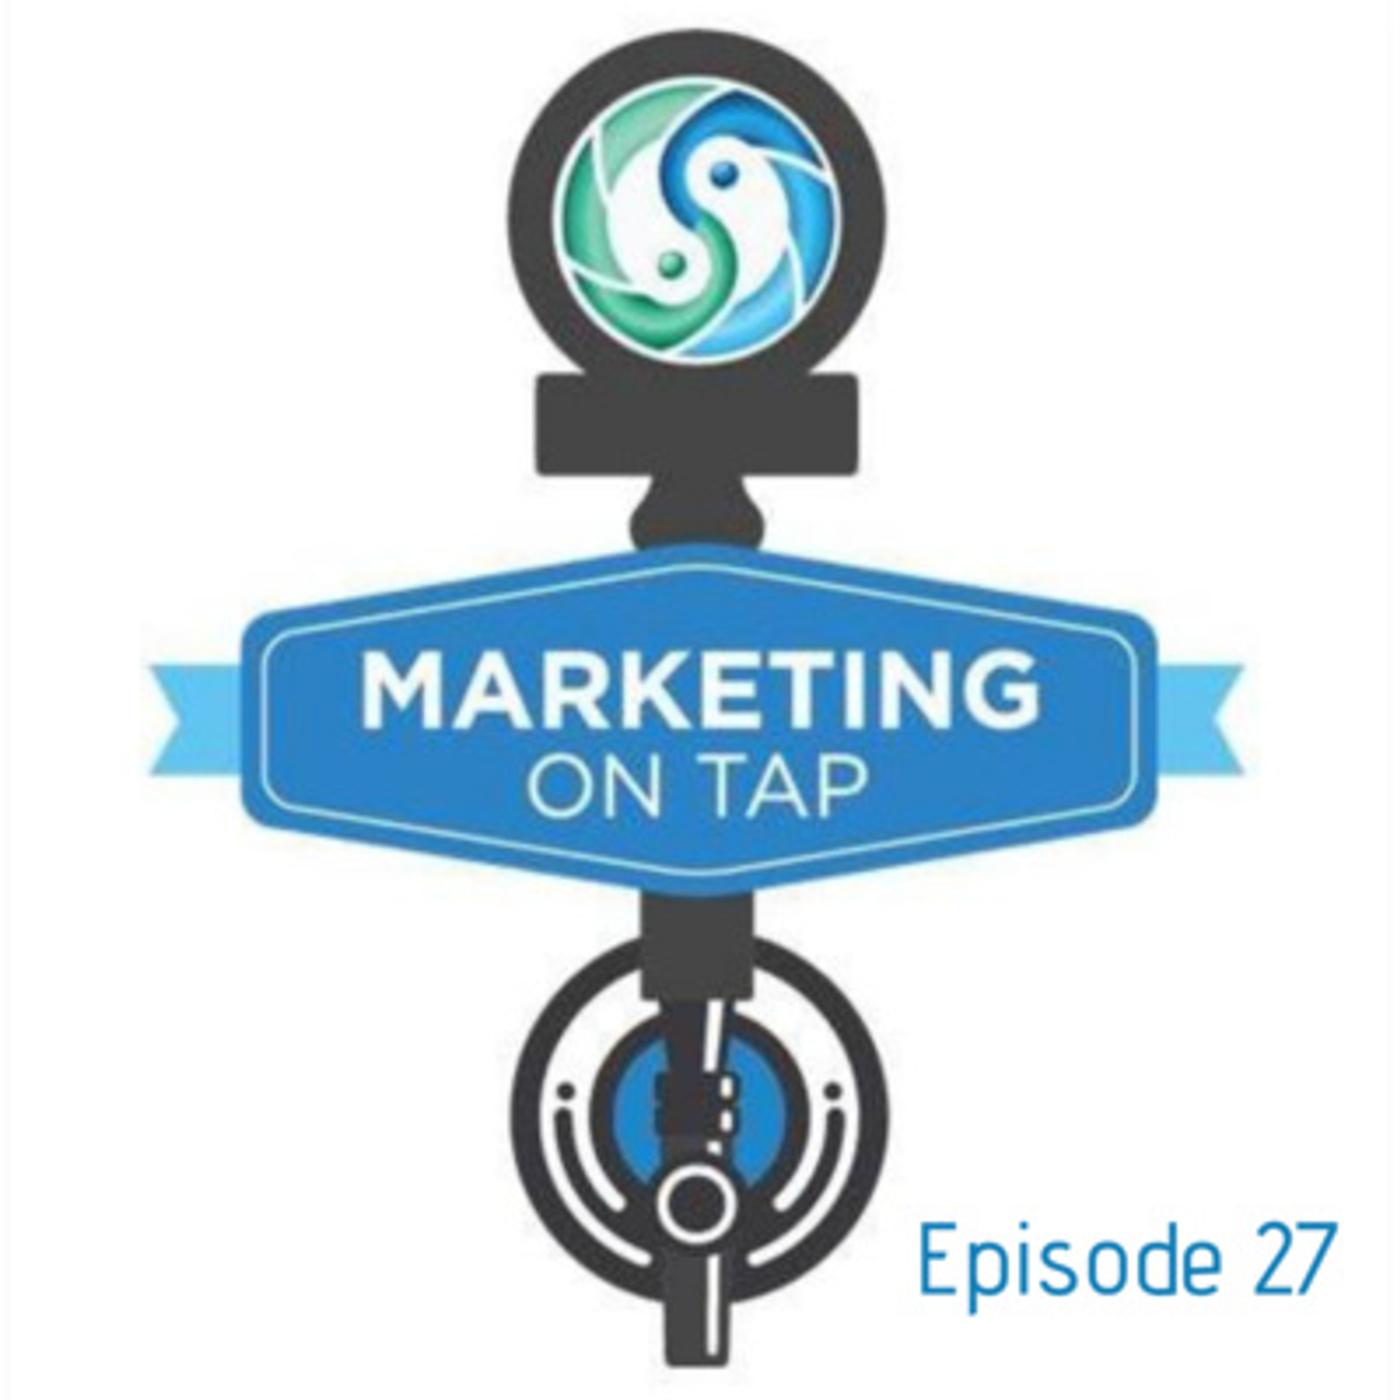 Episode 27: Boycott Marketing: Wendy's and Marvel/DC